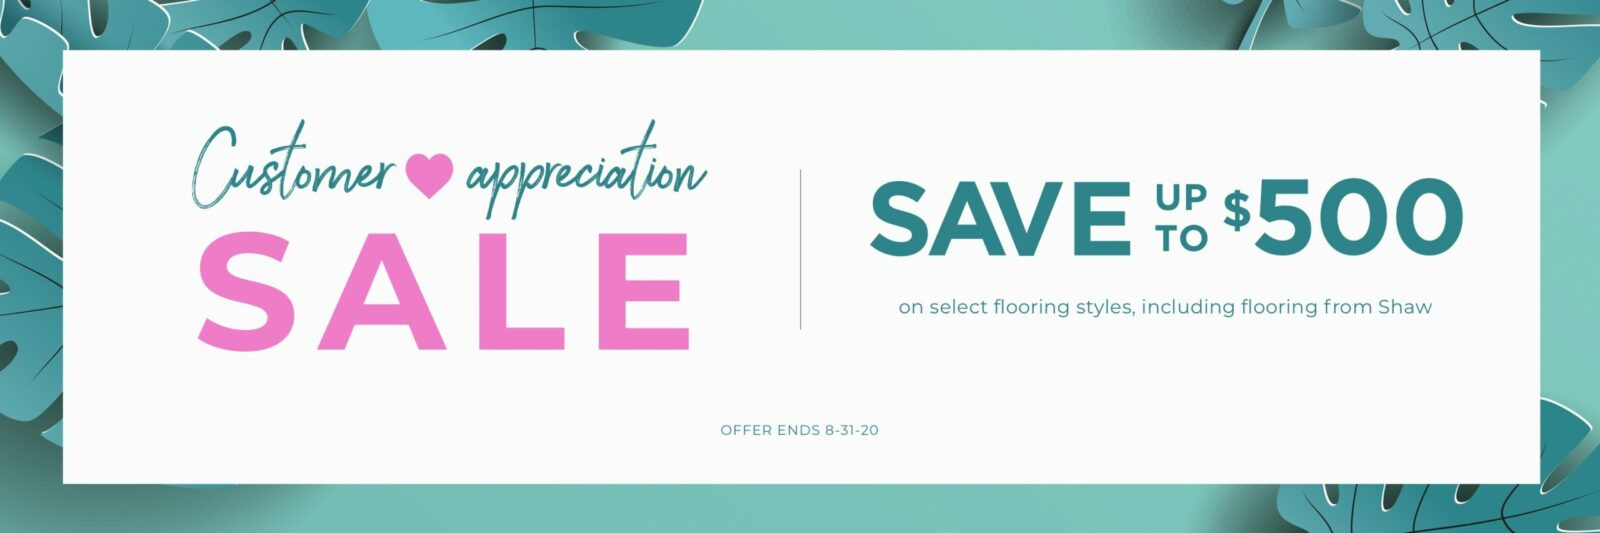 Customer Appreciation Sale | Shan's Carpets & Fine Flooring